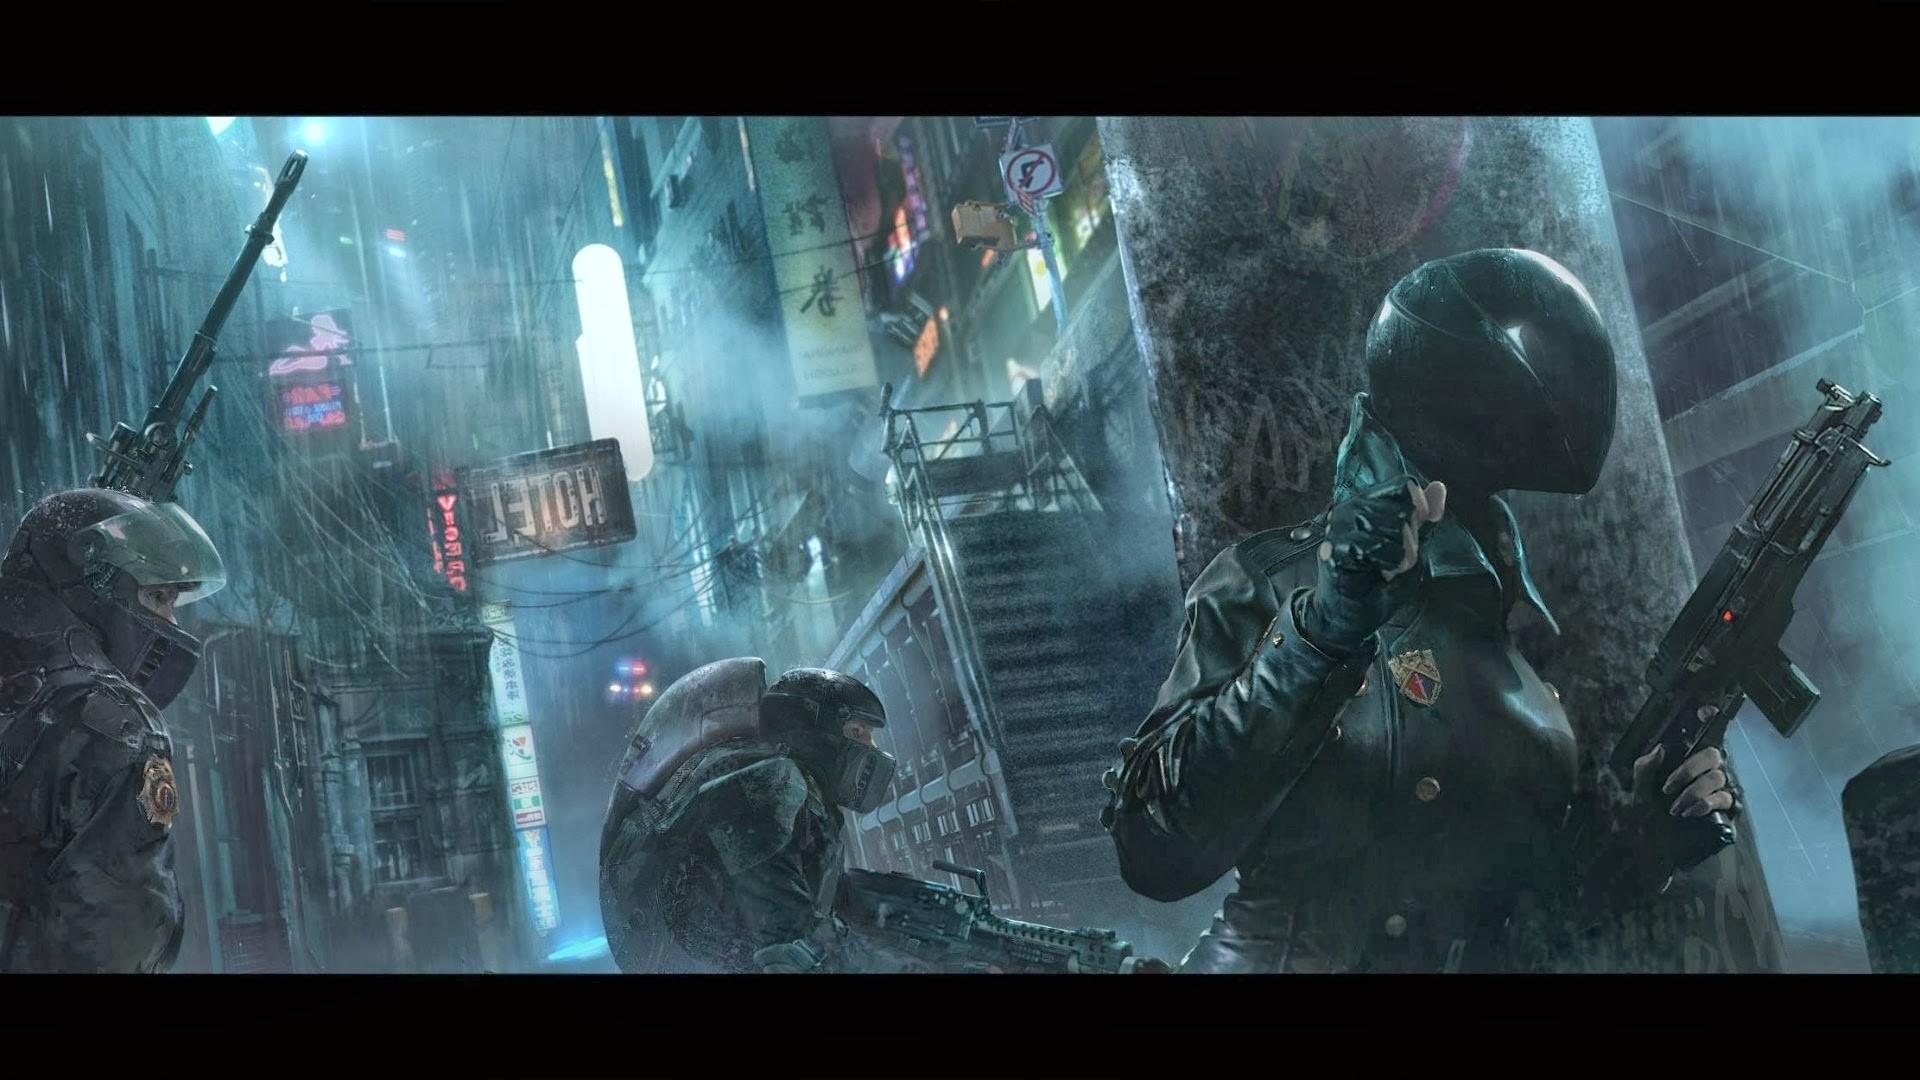 cyberpunk wallpaper HD 1920x1080